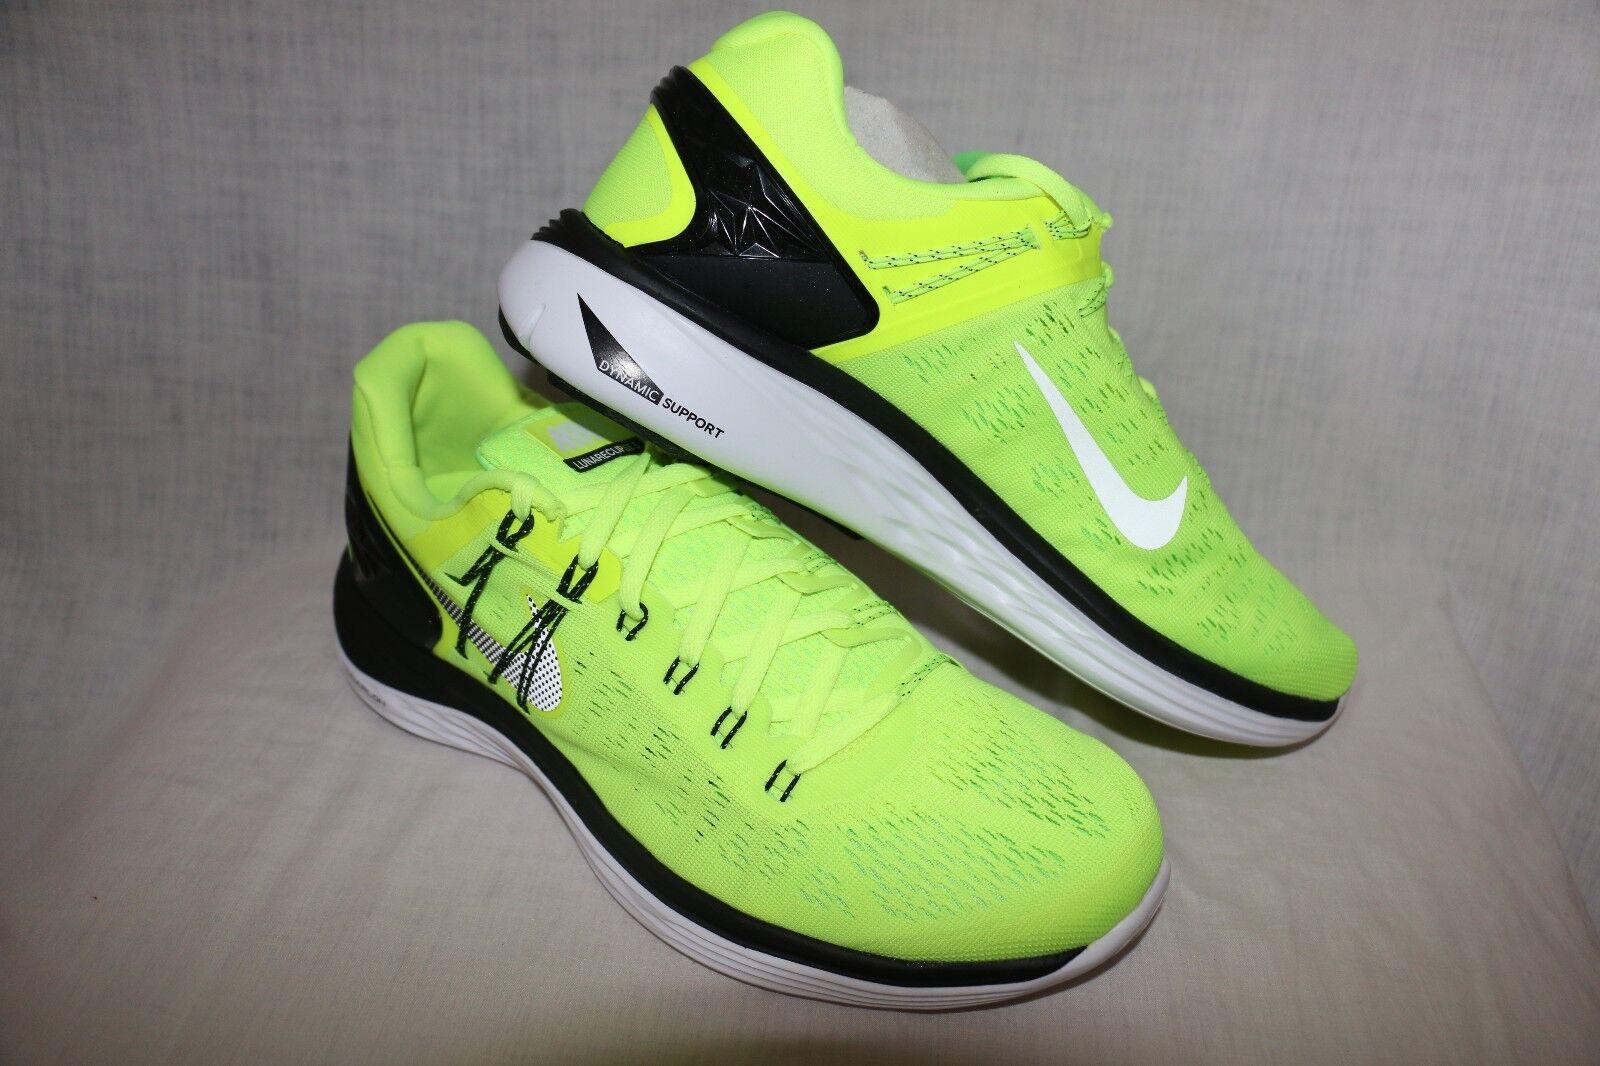 Nike Lunar Eclipse 5 Athletic Running  - Volt/White-Flash Lime10,11,12,14